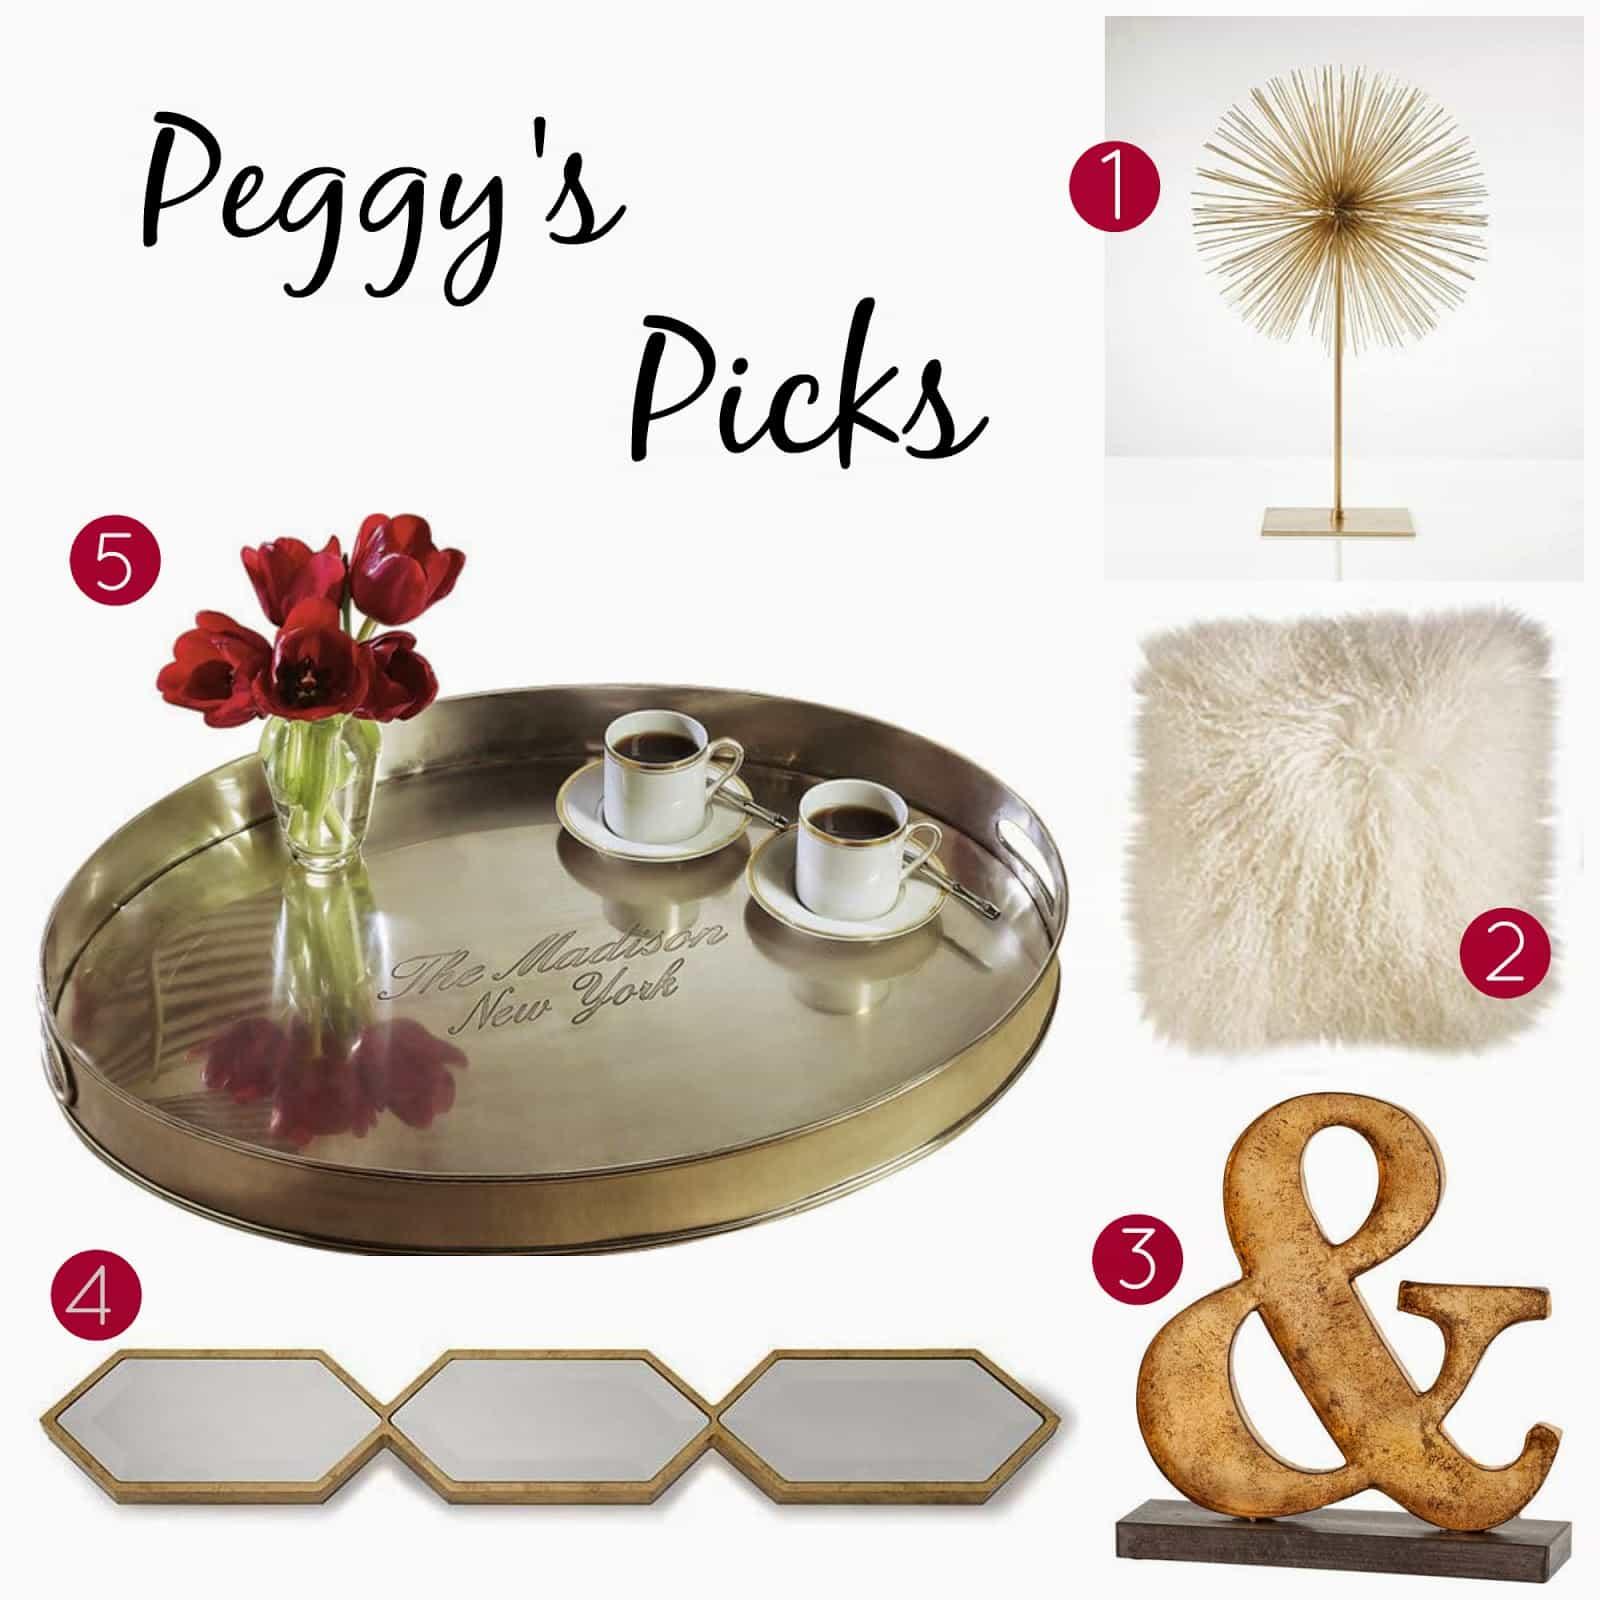 Gift Guide: Peggy's Picks